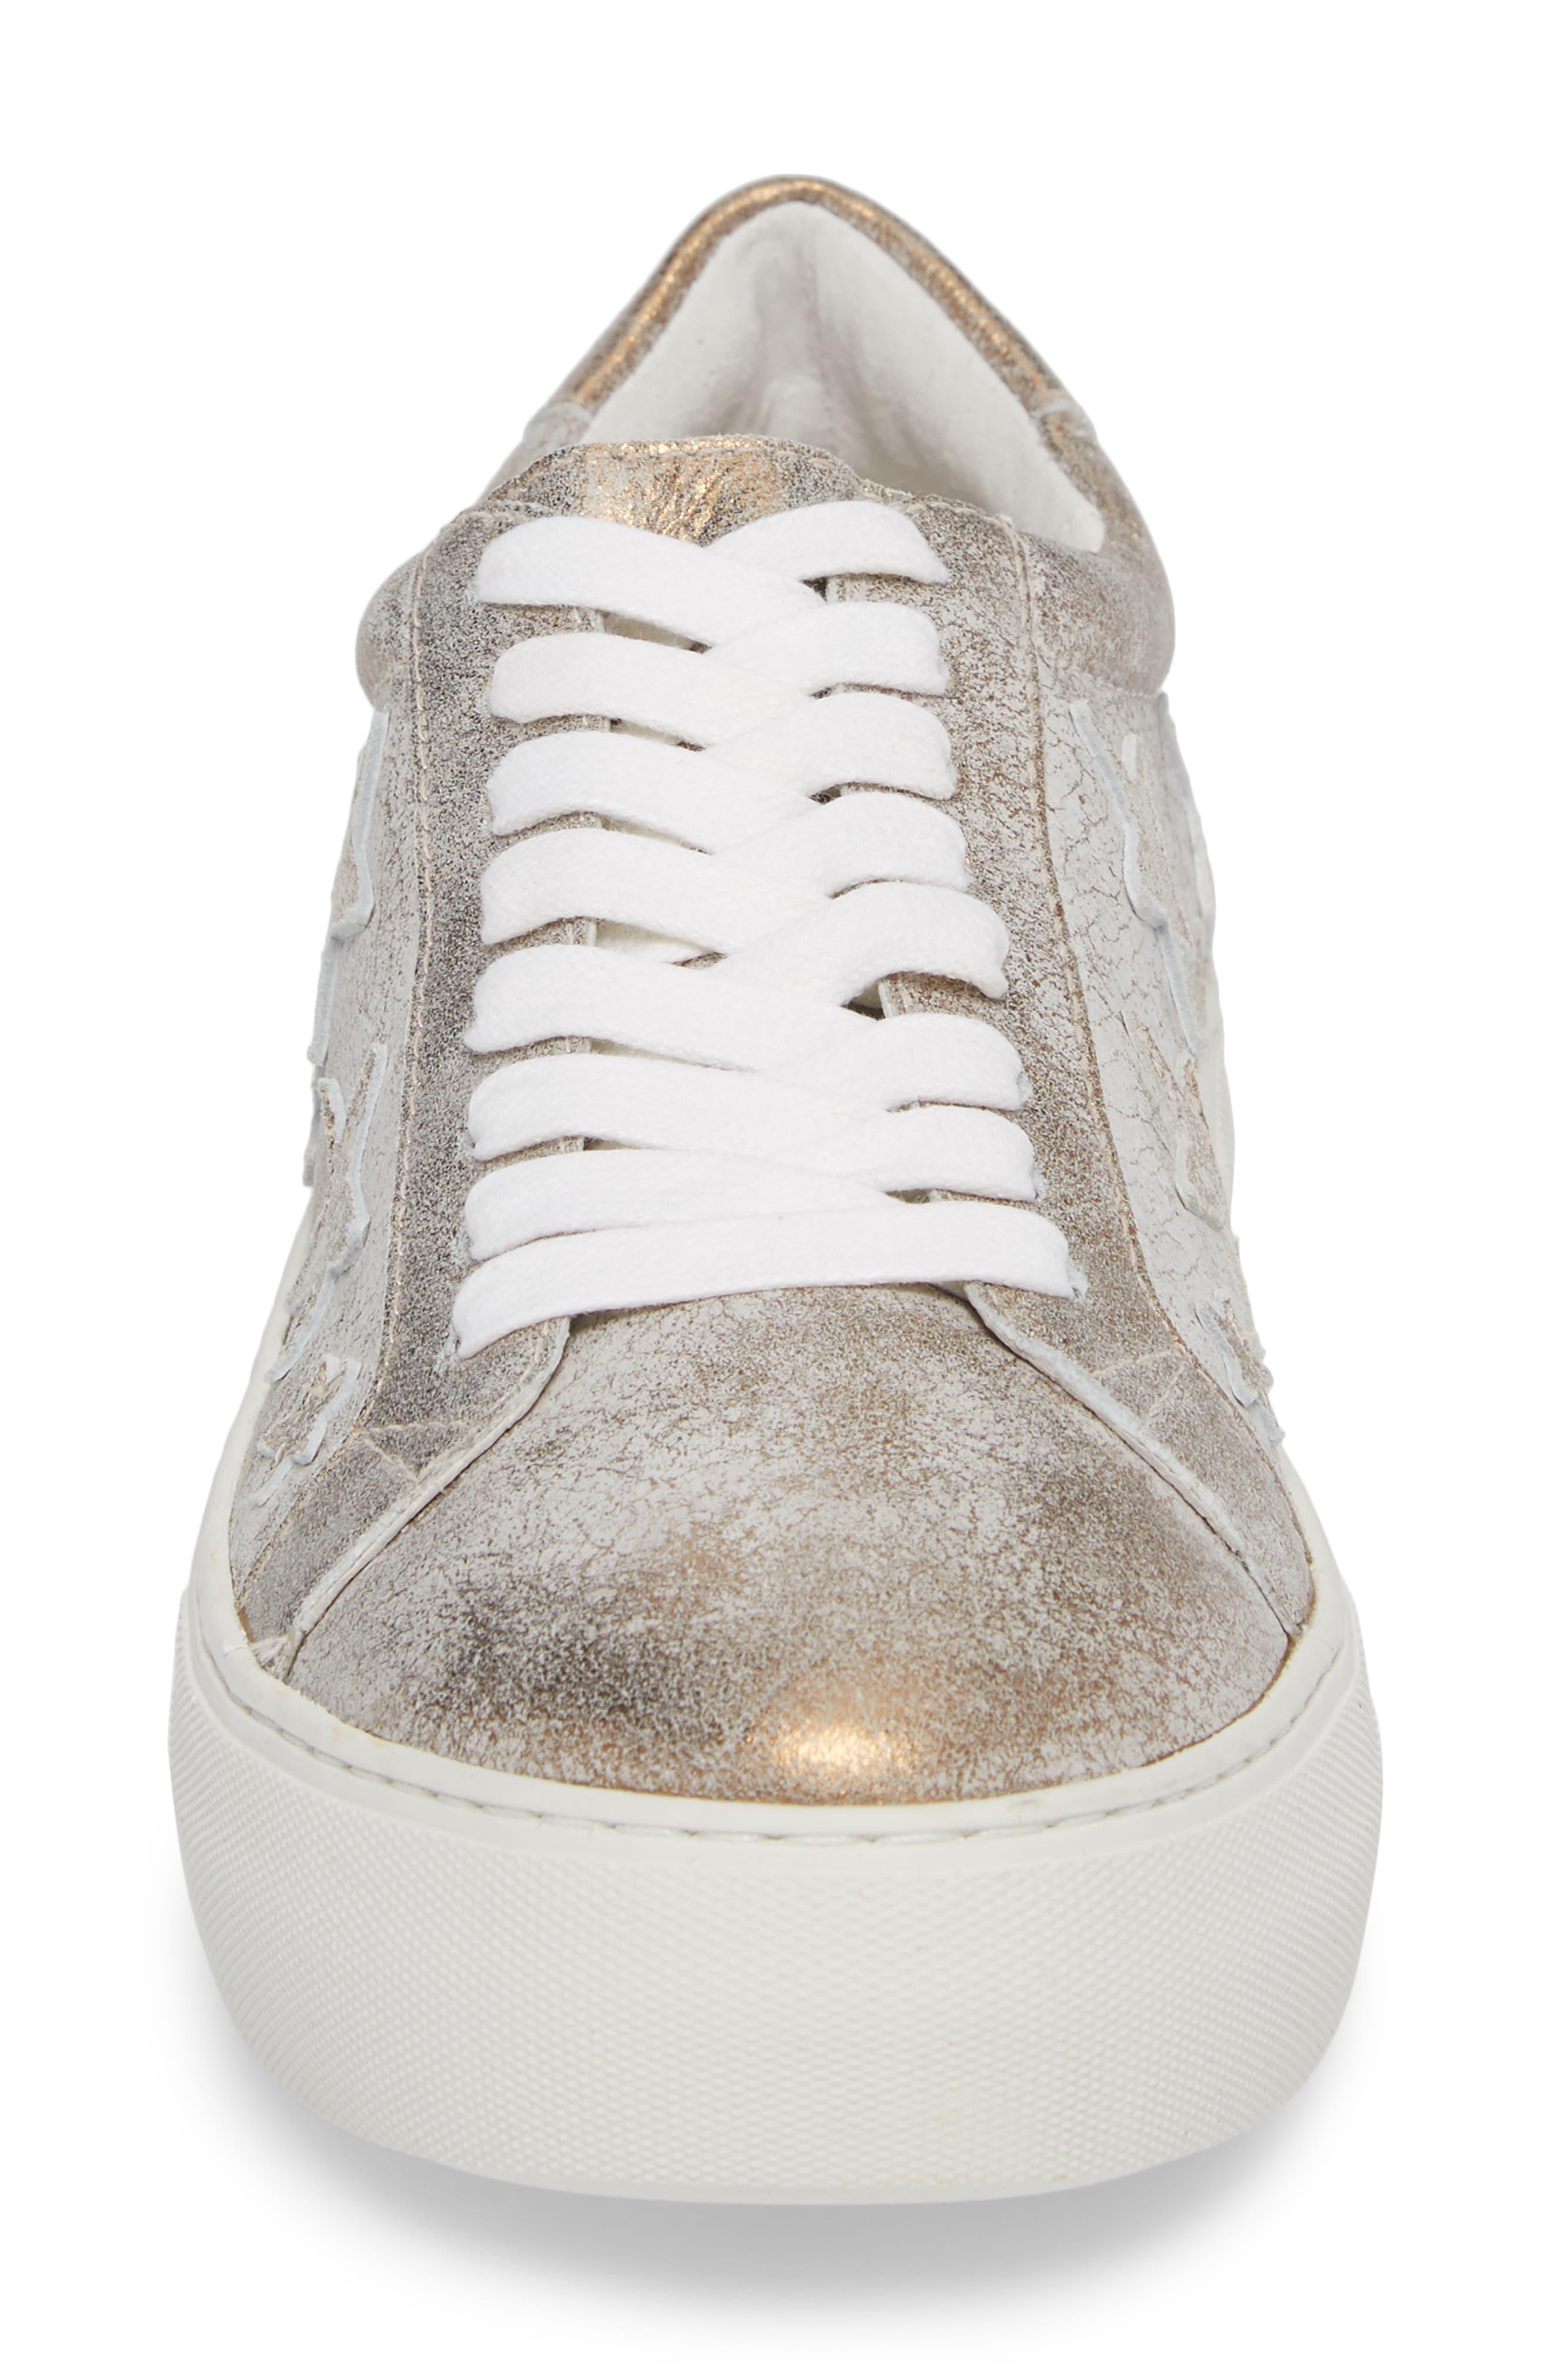 Apostle Sneaker,                             Alternate thumbnail 4, color,                             Bronze Suede